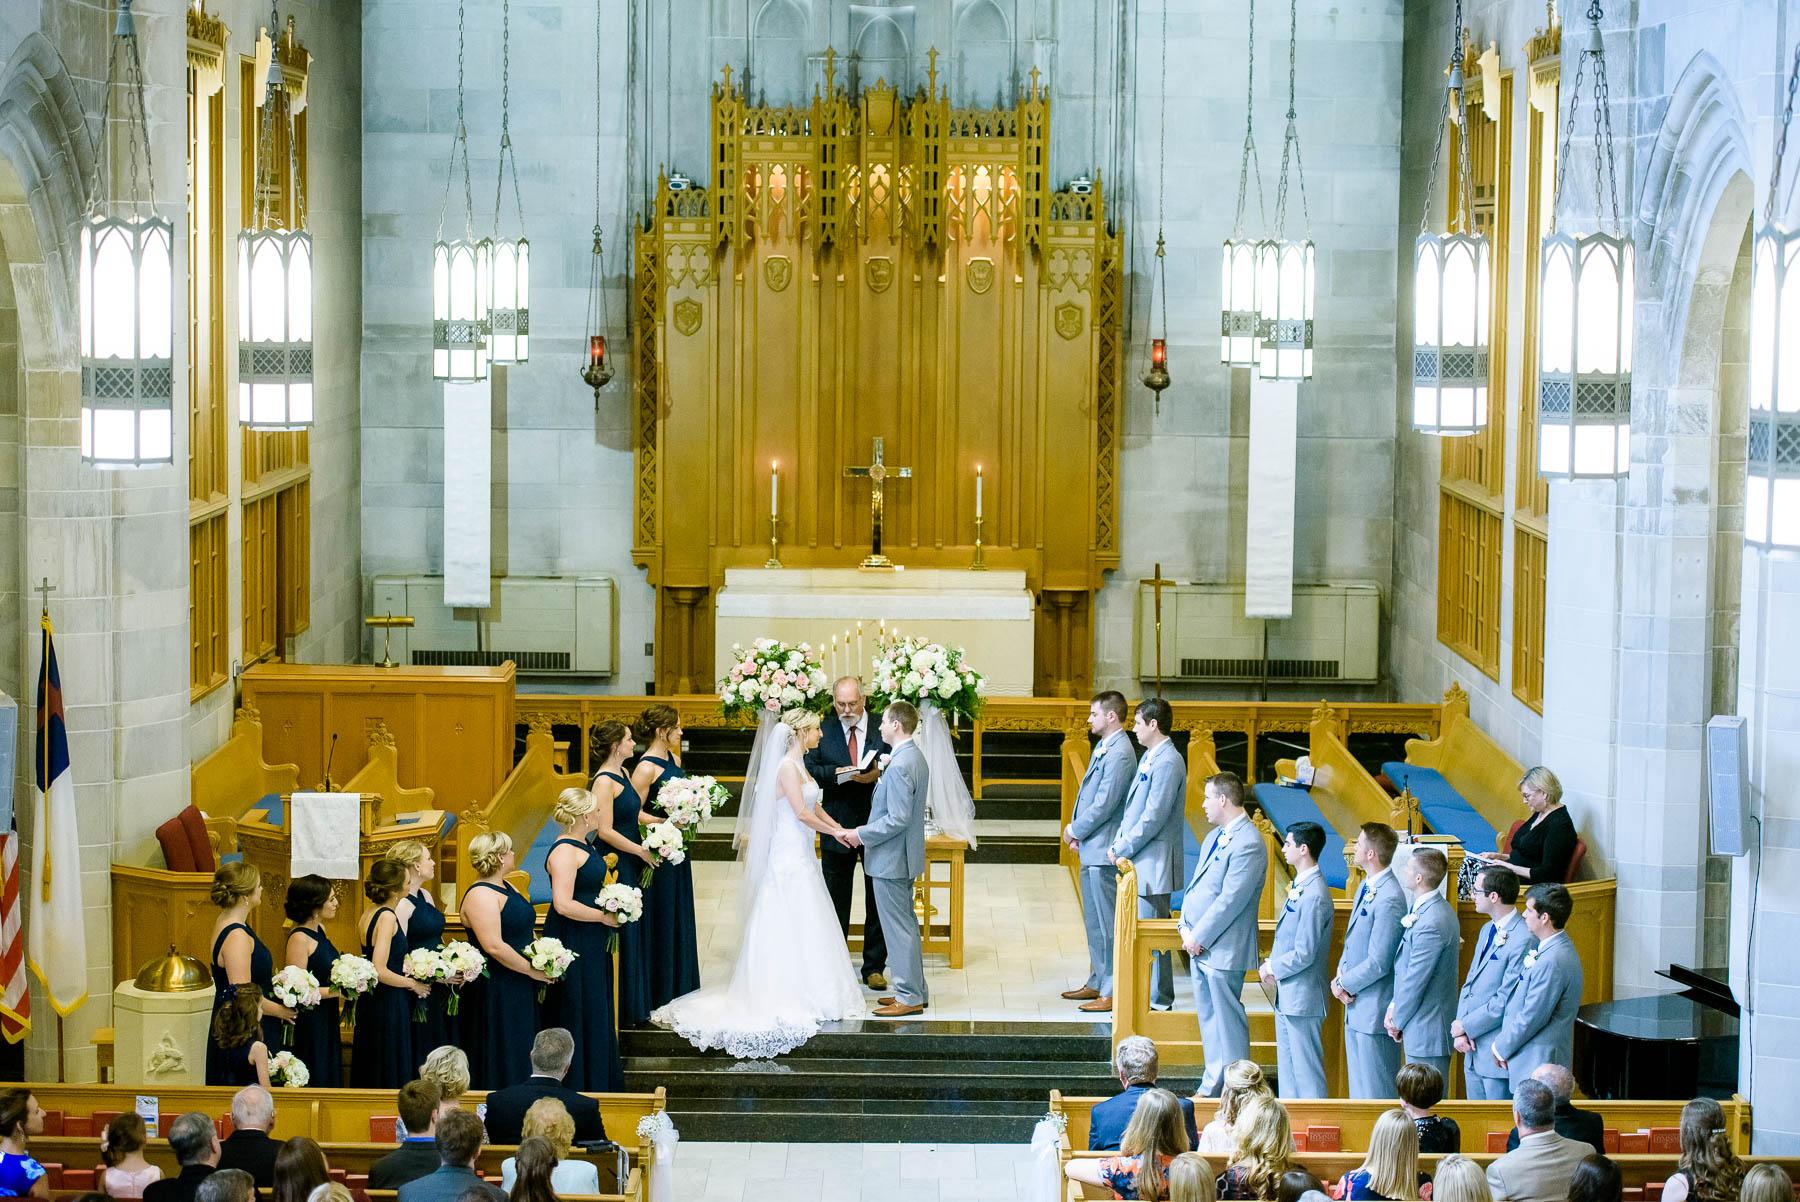 Wedding ceremony at Baker Memorial United Methodist Church in St. Charles